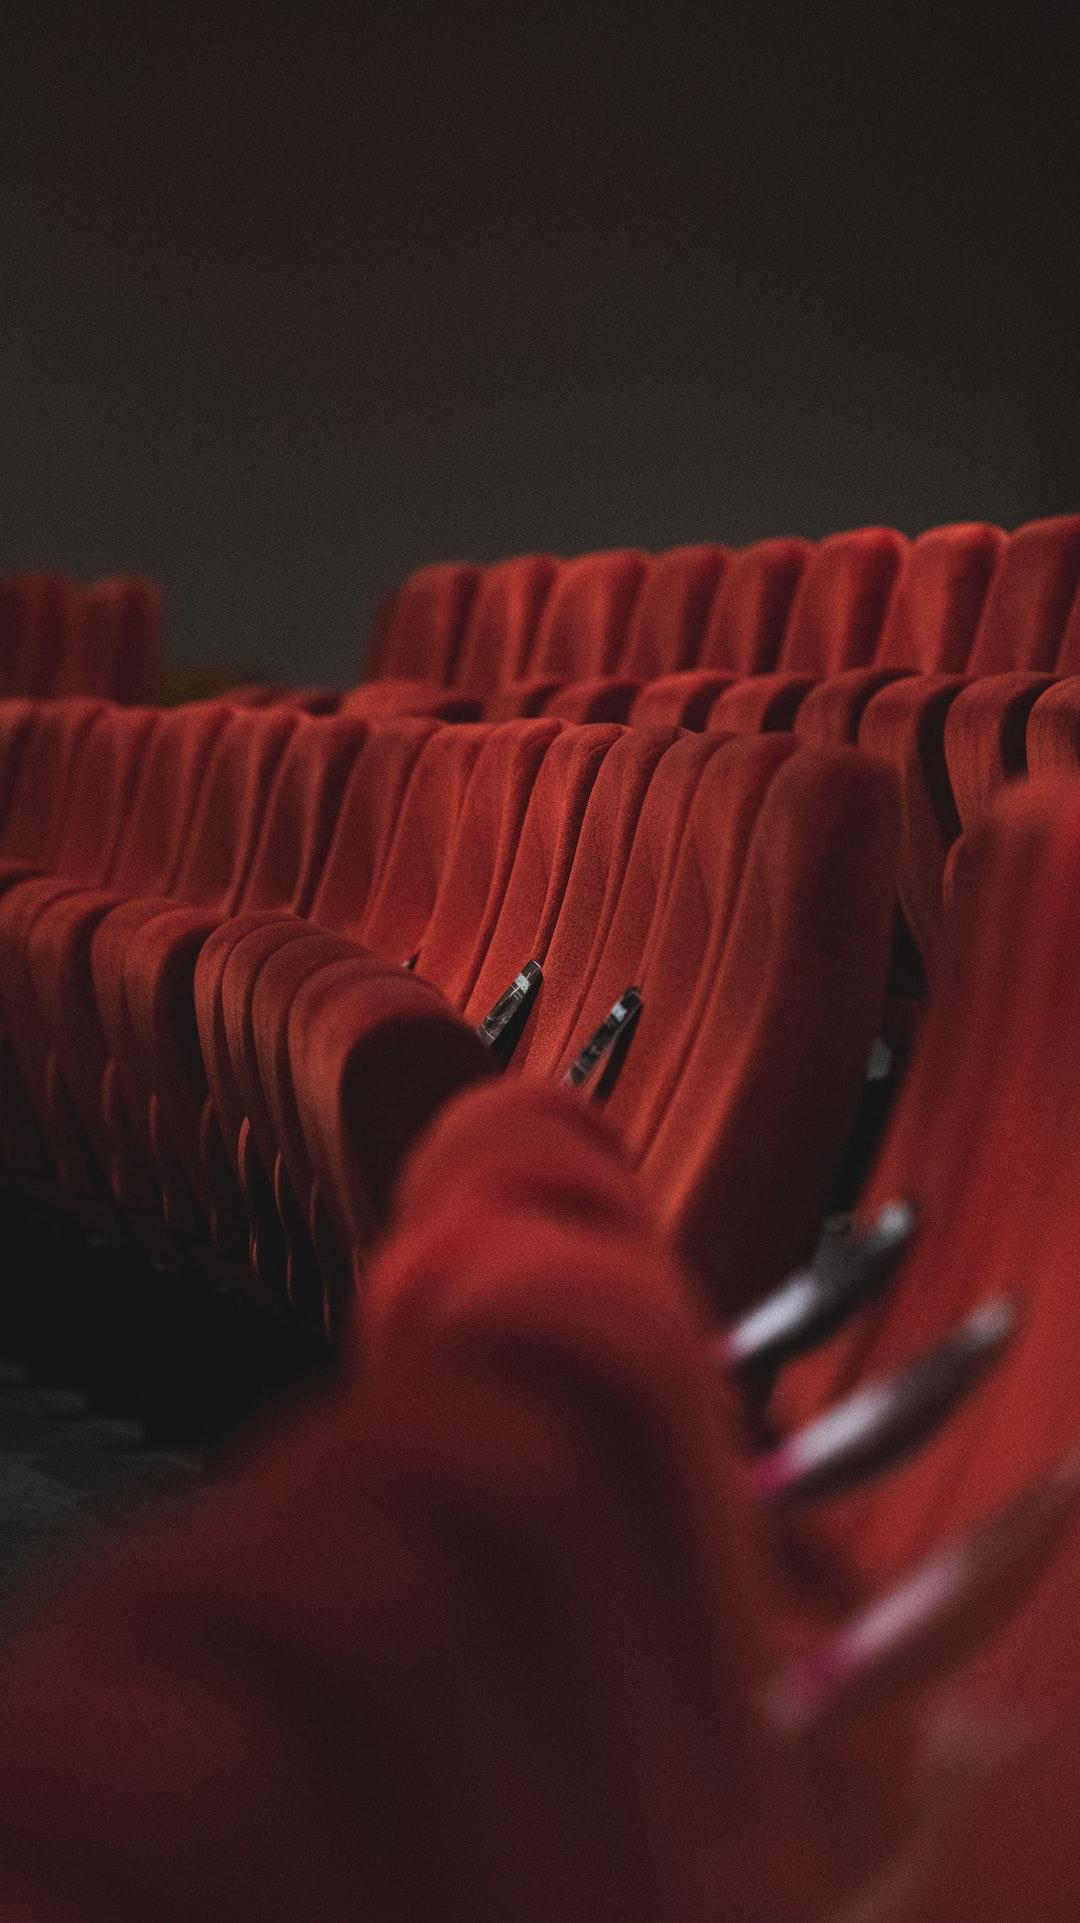 Theatre seating